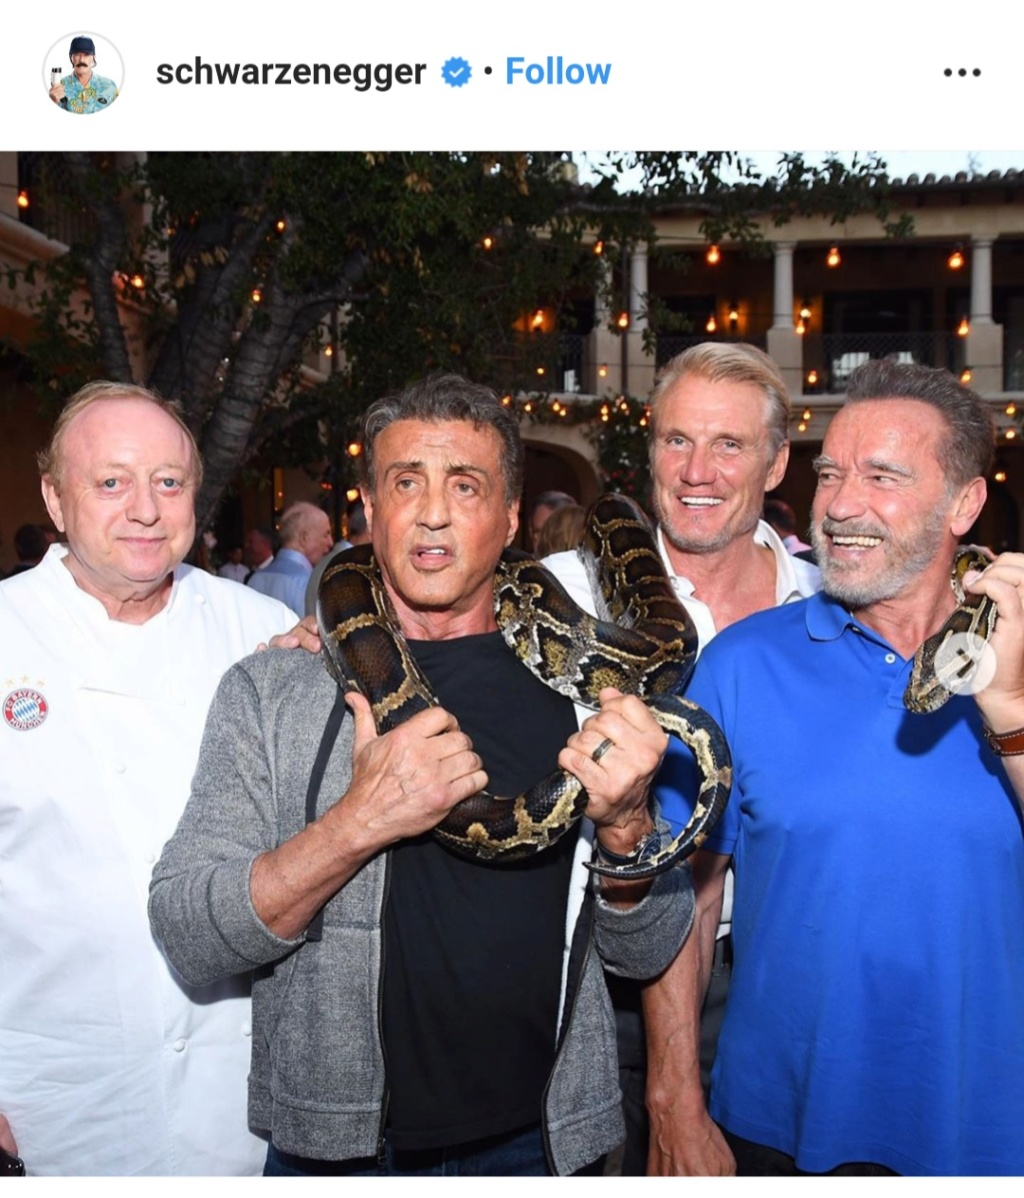 ¿Cuánto mide Sylvester Stallone? - Real height - Página 2 Img_2041